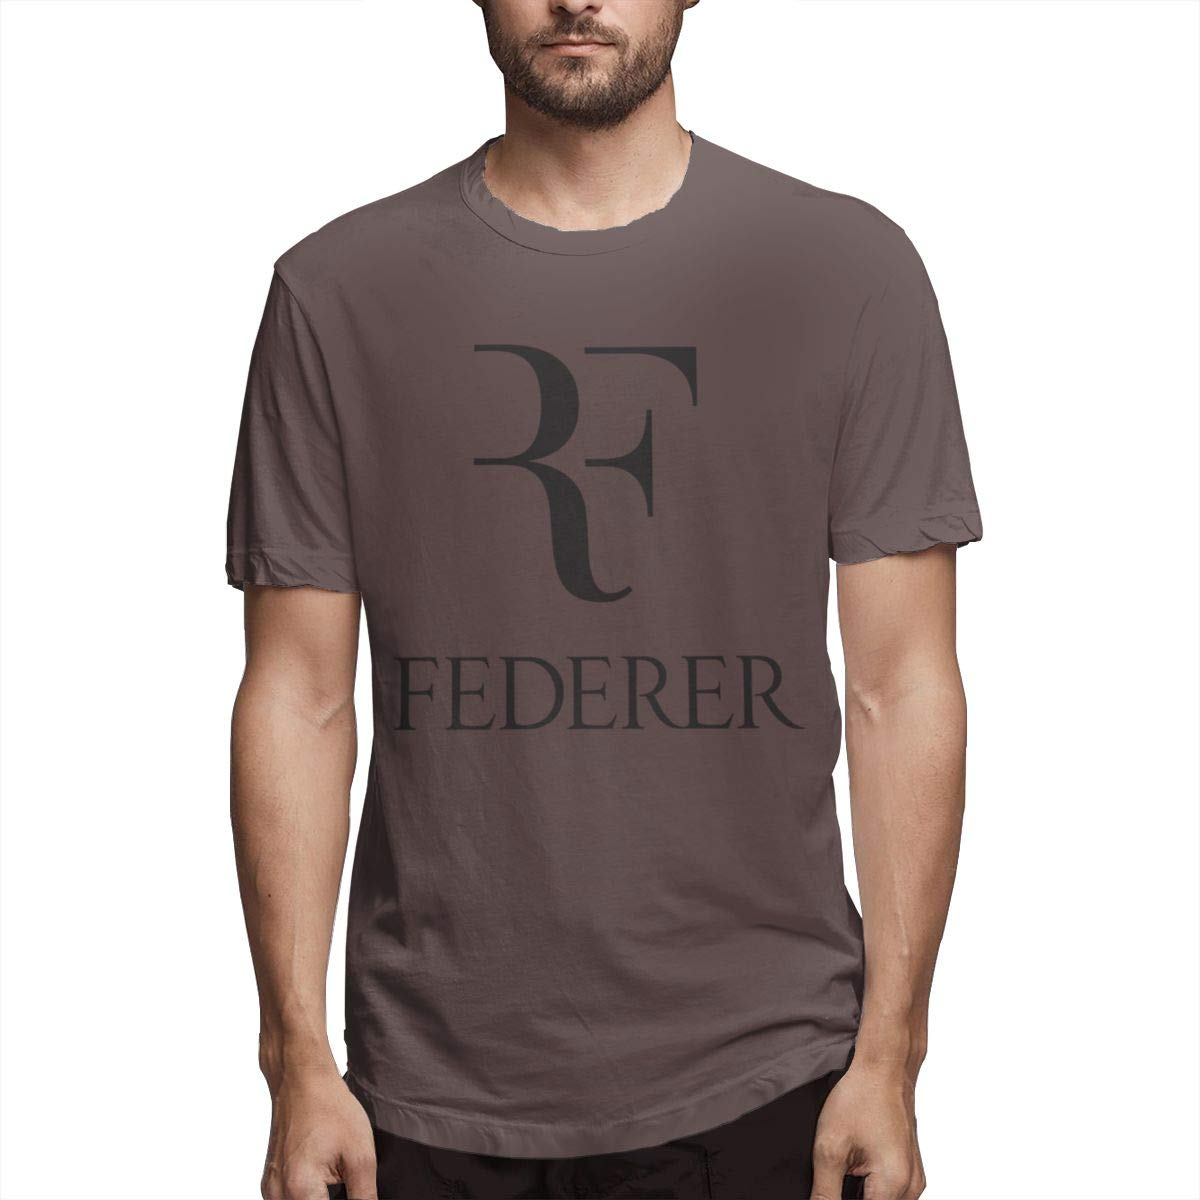 LANBRELLA Mens Roger Federer Crew Neck Short Sleeve T-Shirt